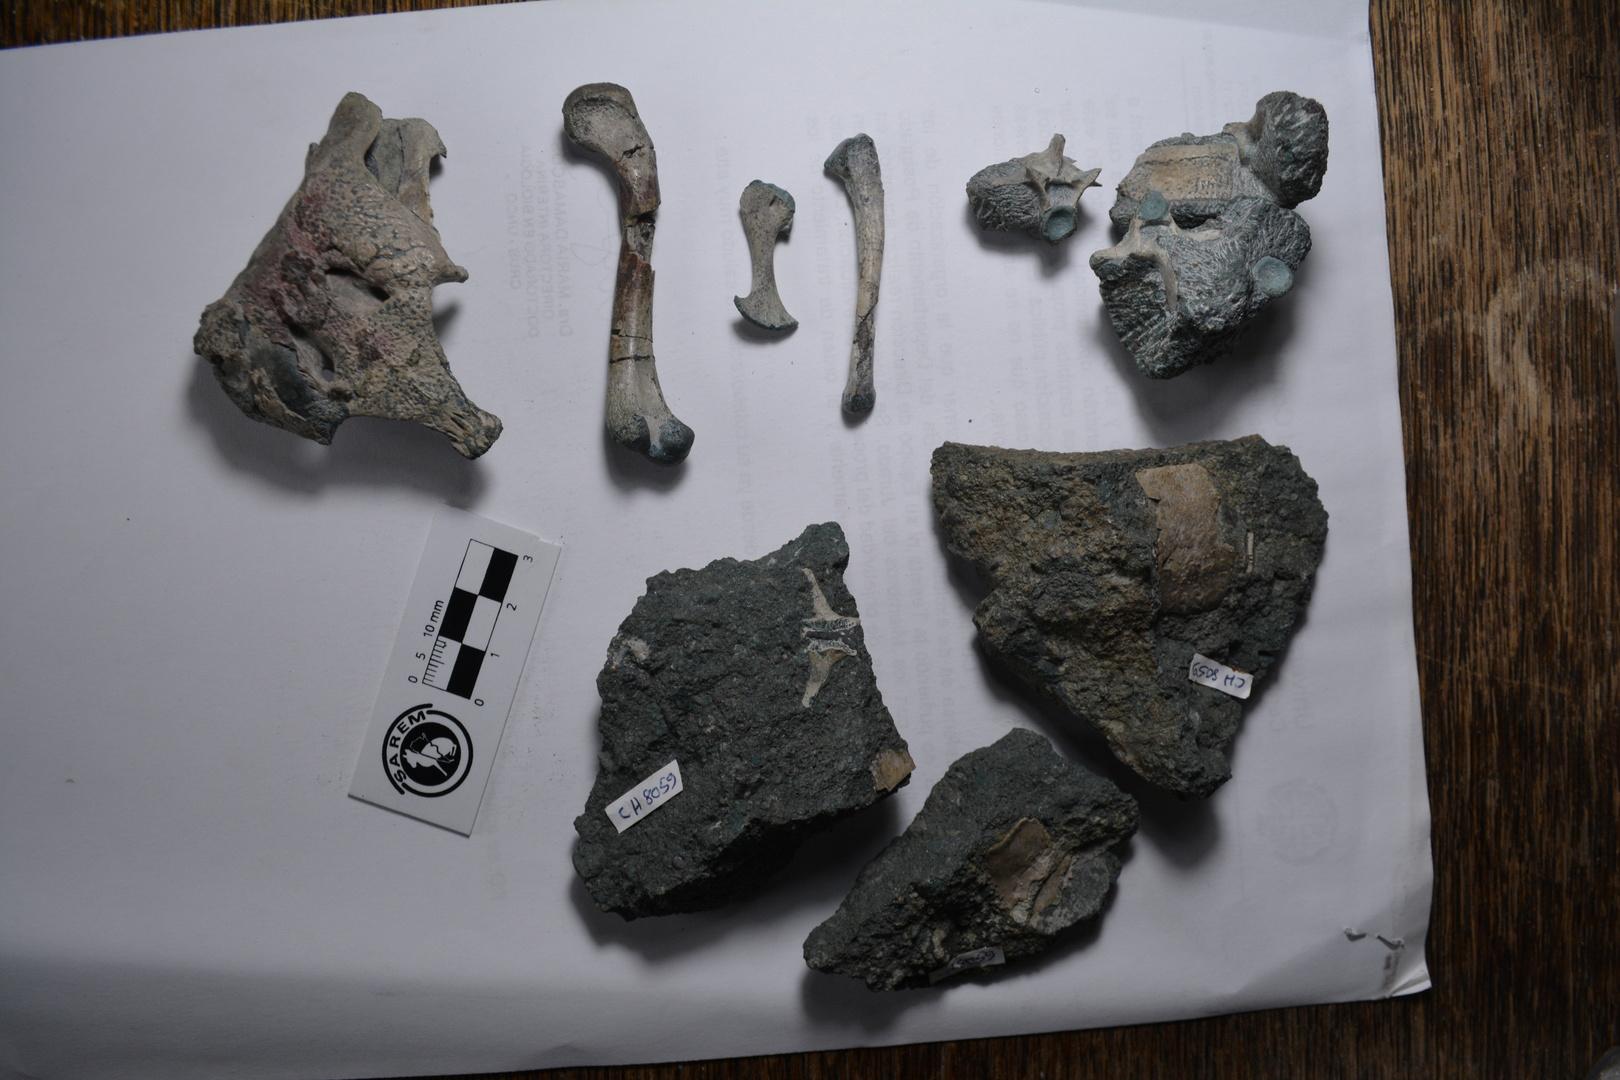 عمره 150 مليون عام.. اكتشاف <a href='/tags/196611-%D8%AD%D9%81%D8%B1%D9%8A%D8%A9'>حفرية</a>